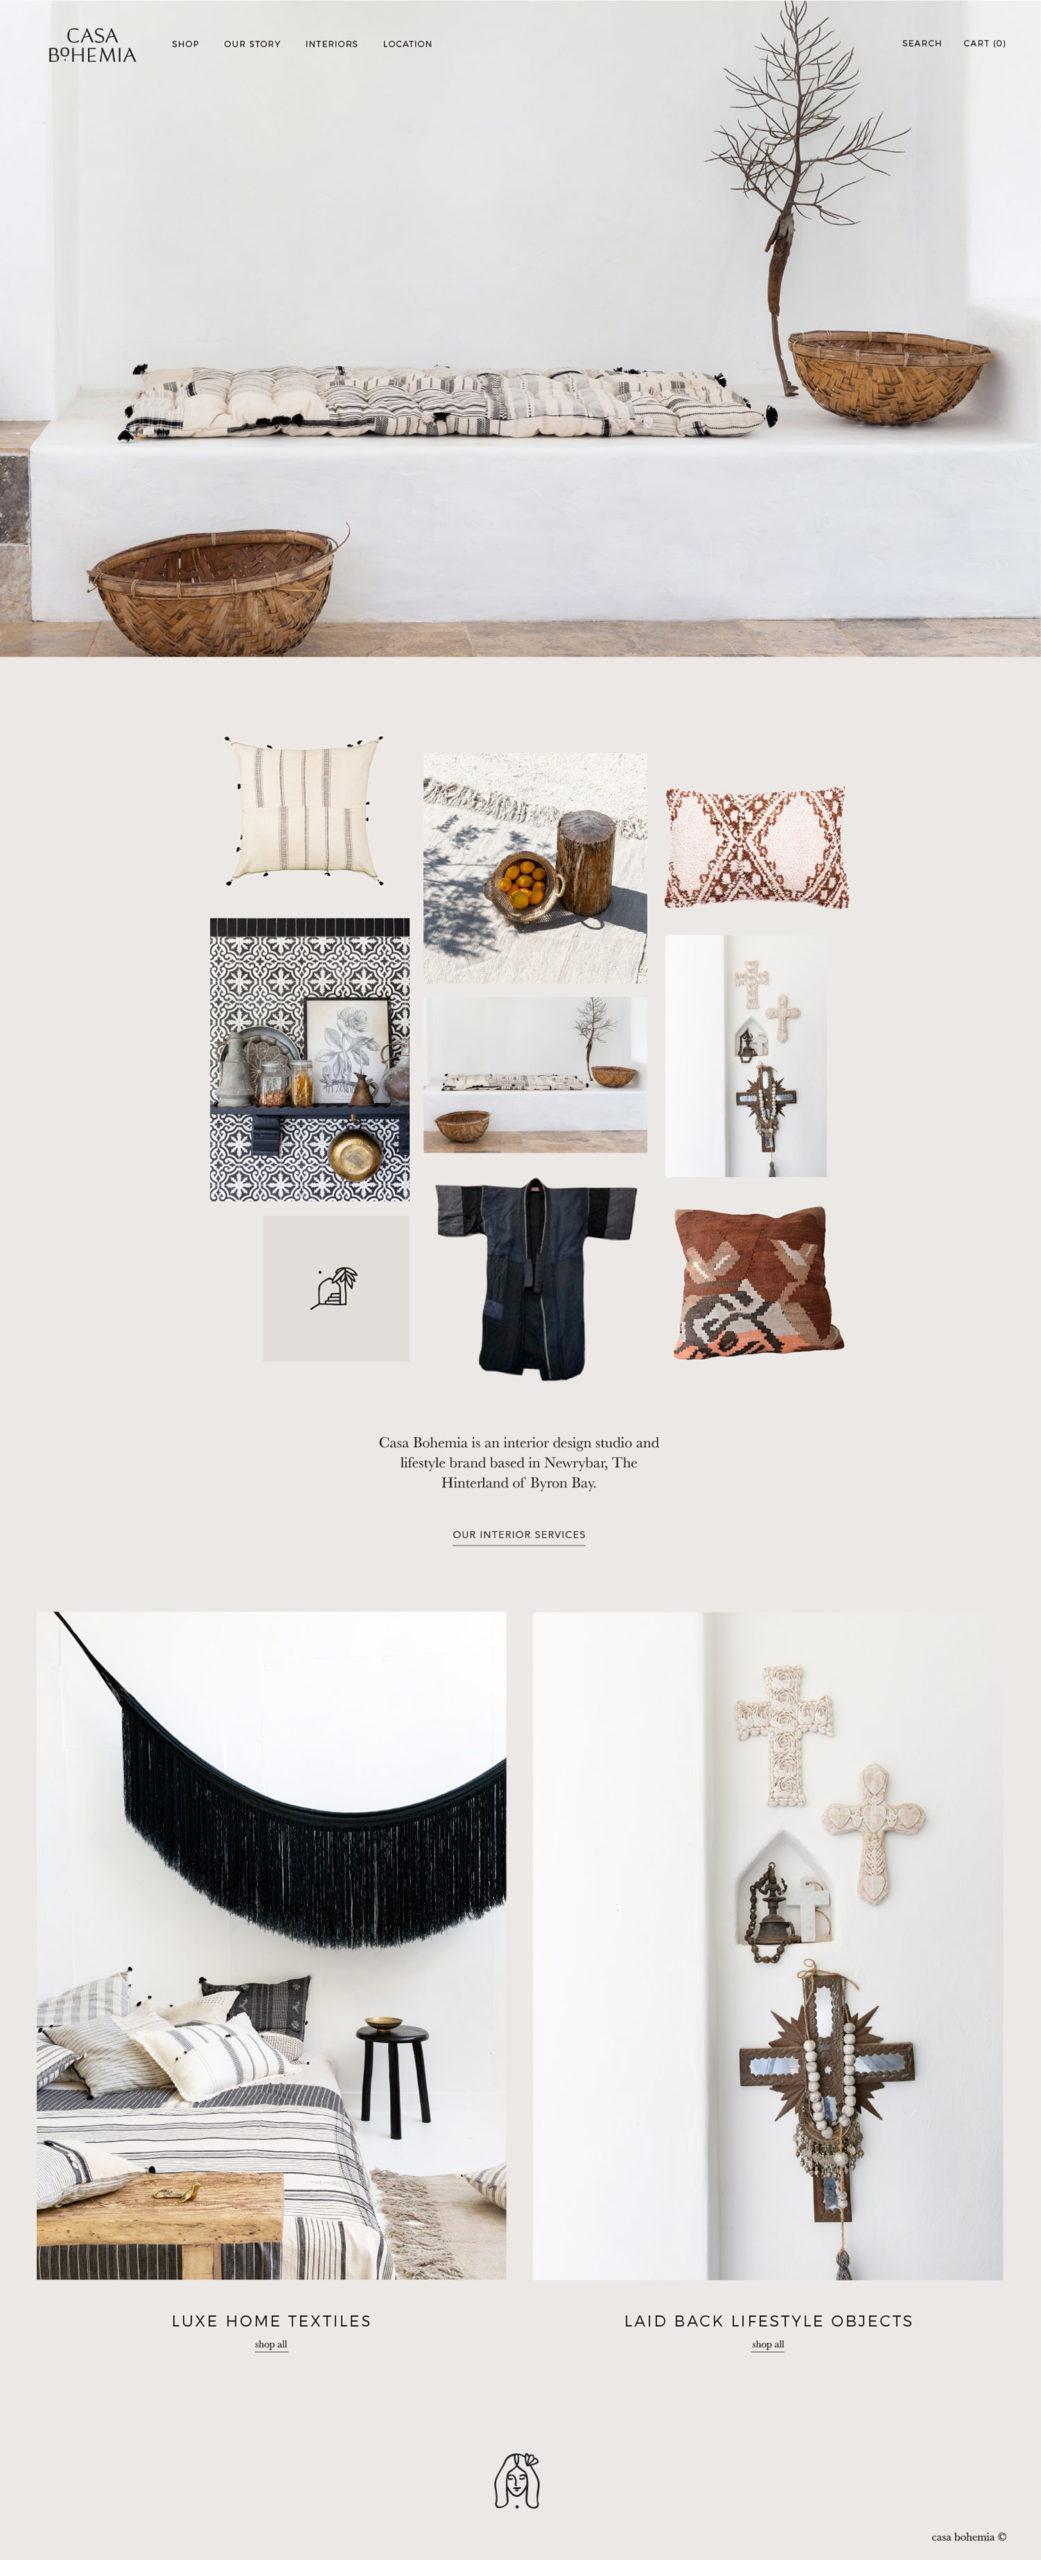 Casa Bohemia website design